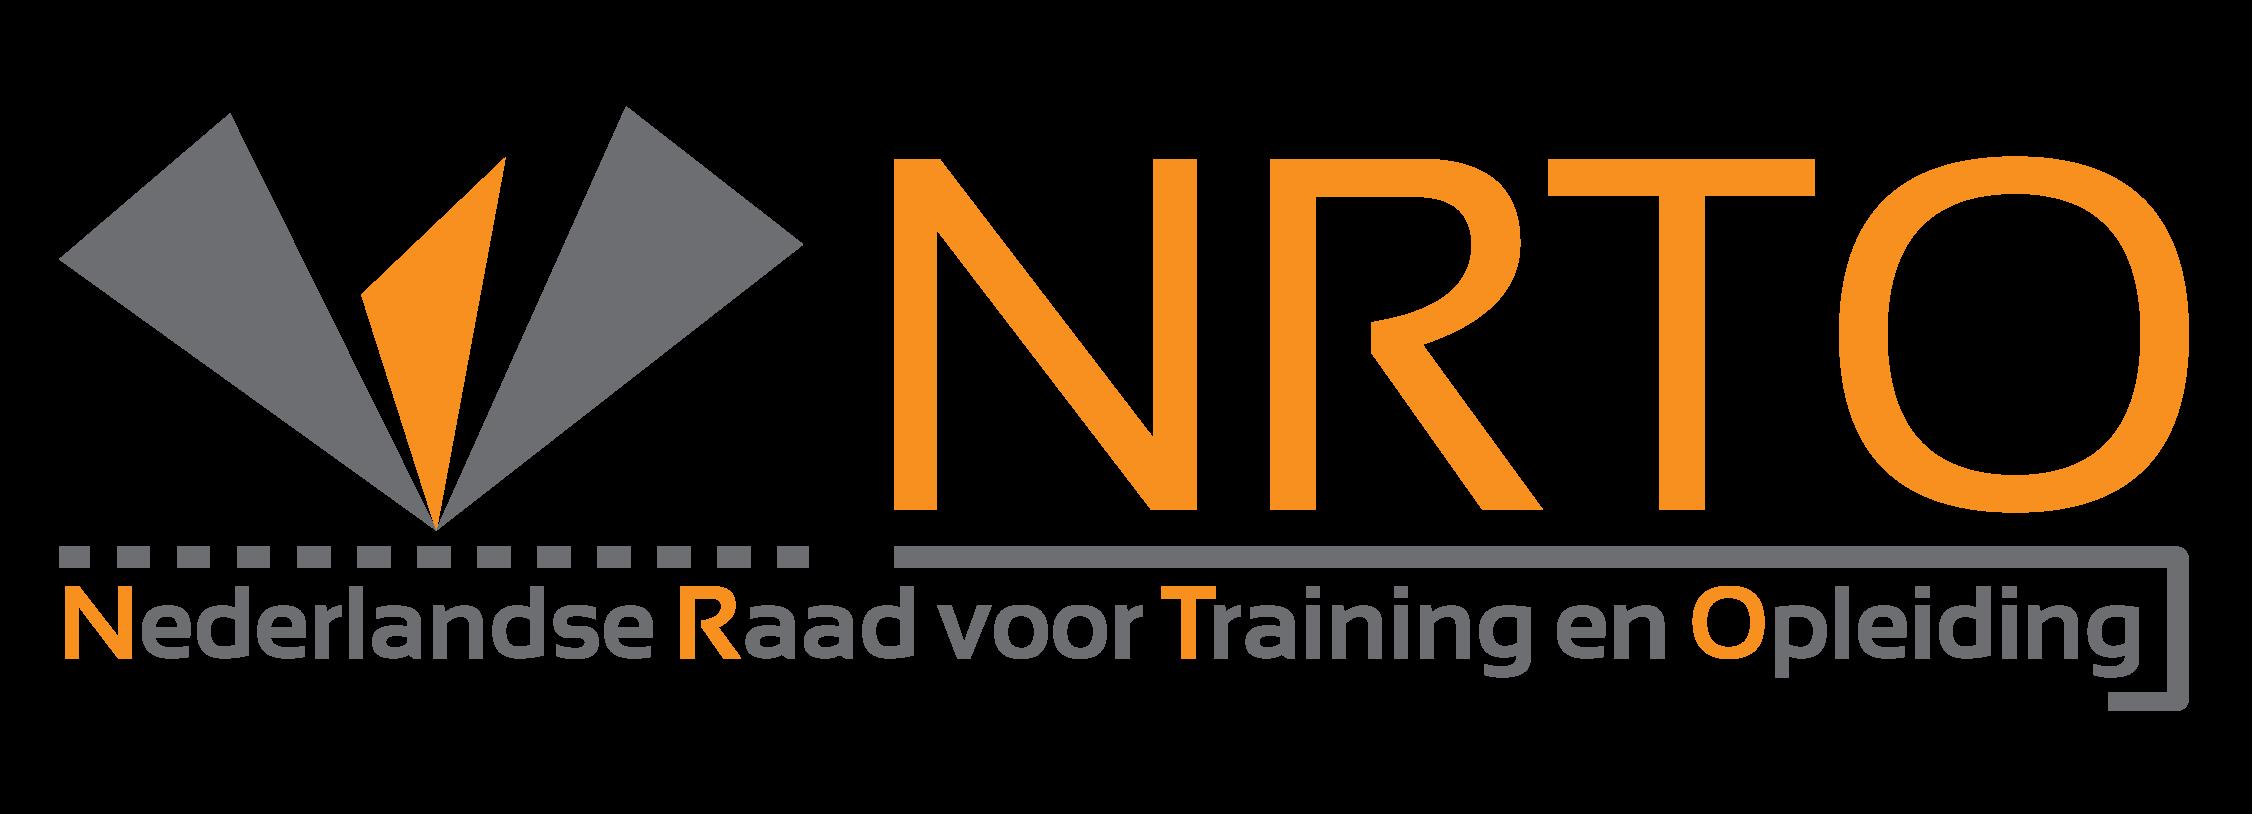 NRTO-logo-01 transparant